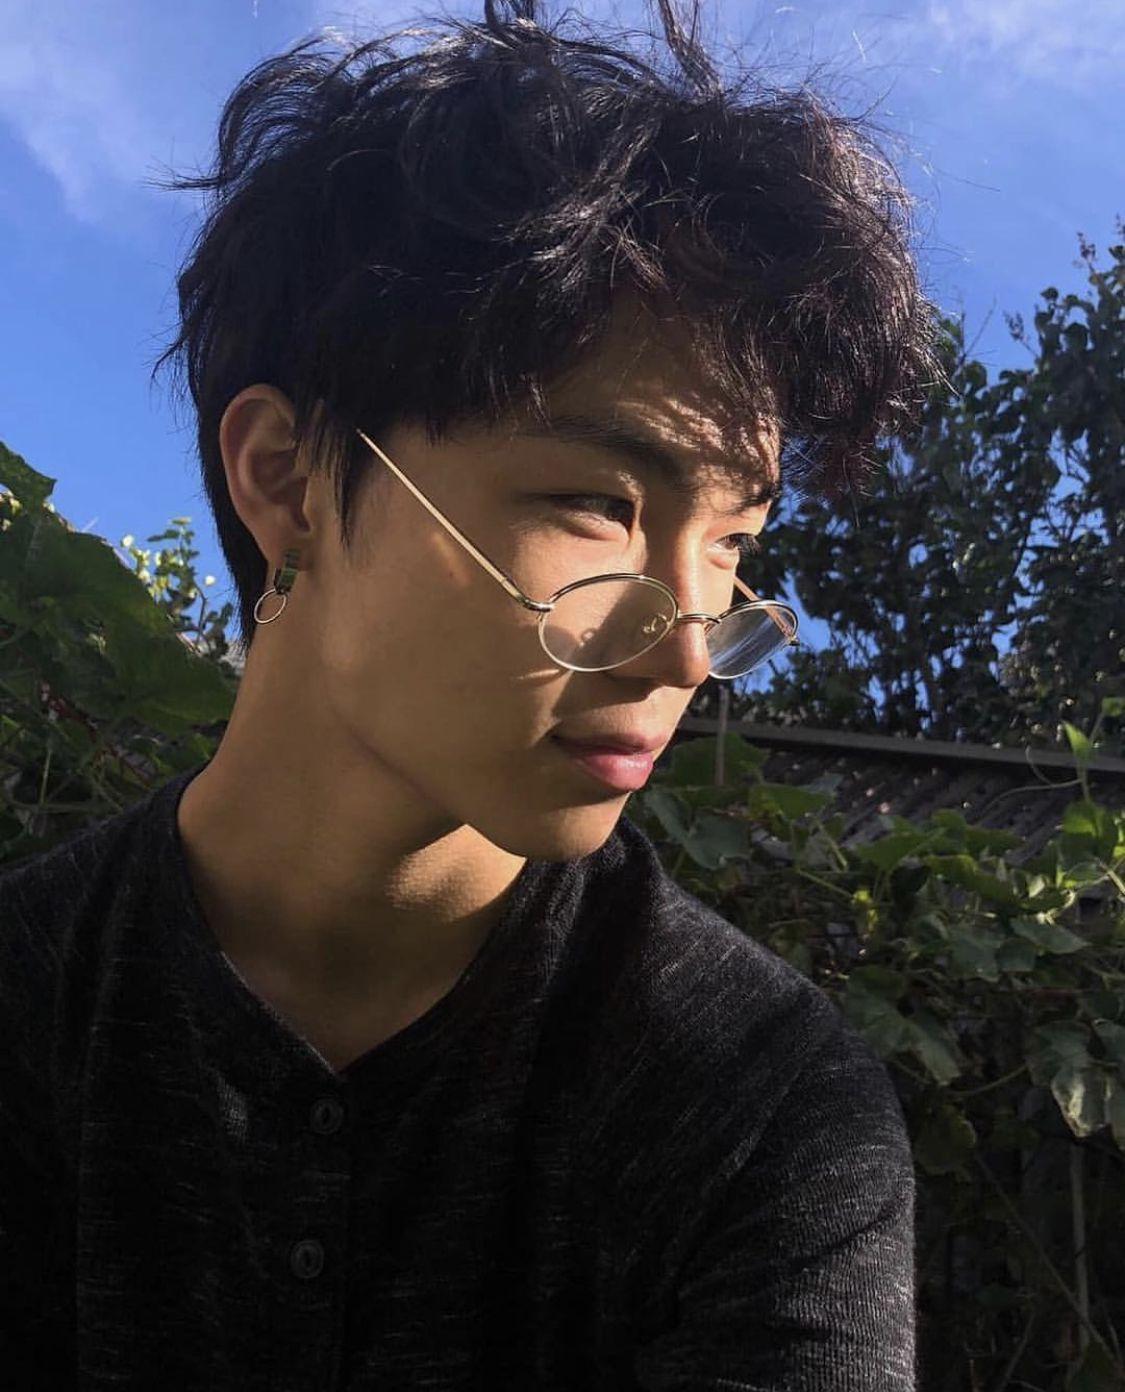 𝙇𝙄𝙈𝙄𝙏   Korean boys hot, Cute asian guys, Asian boys